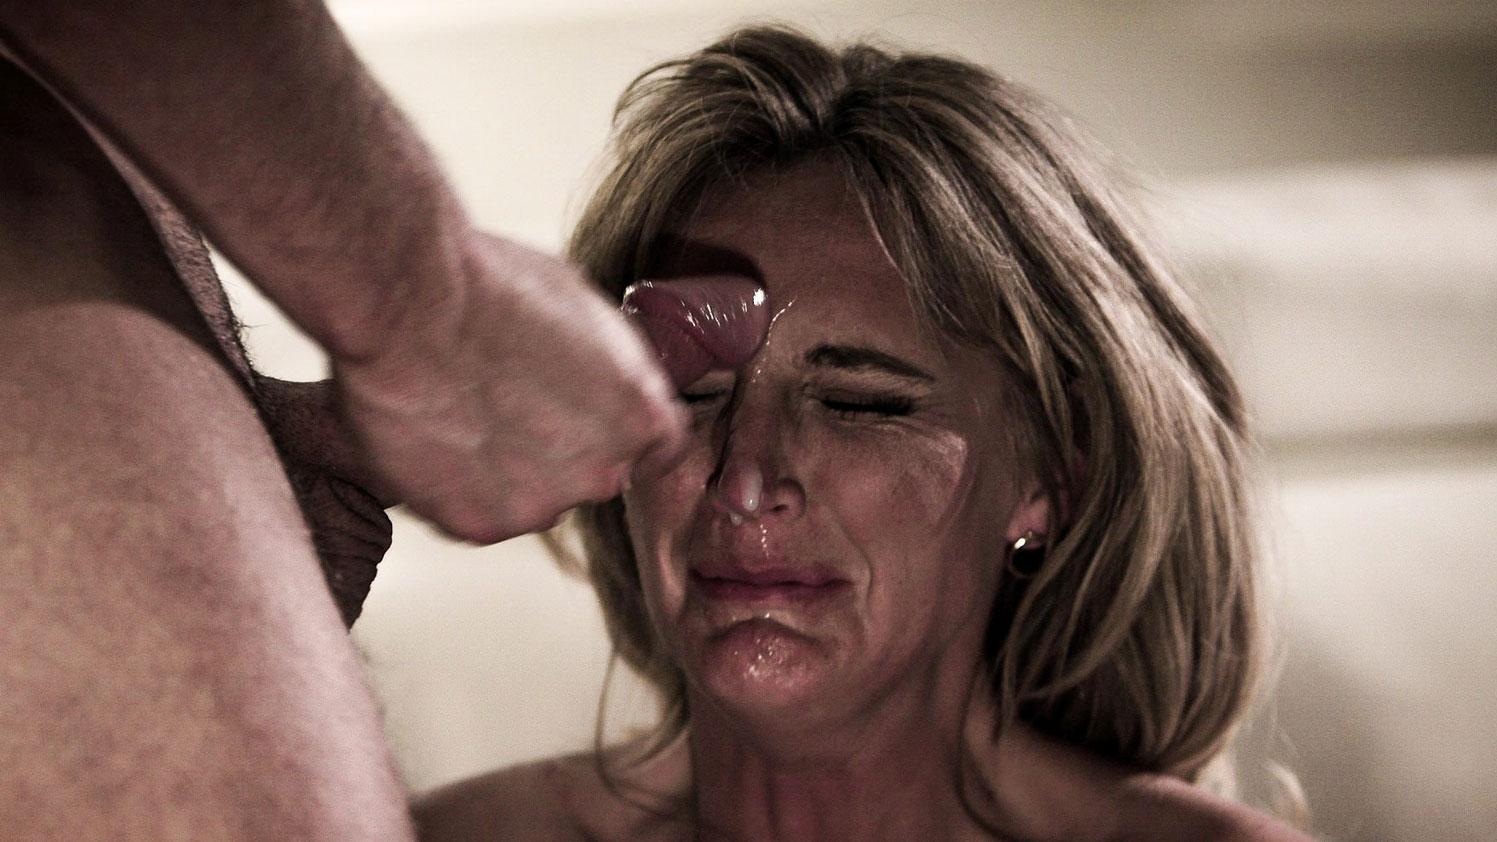 Crying anal mom